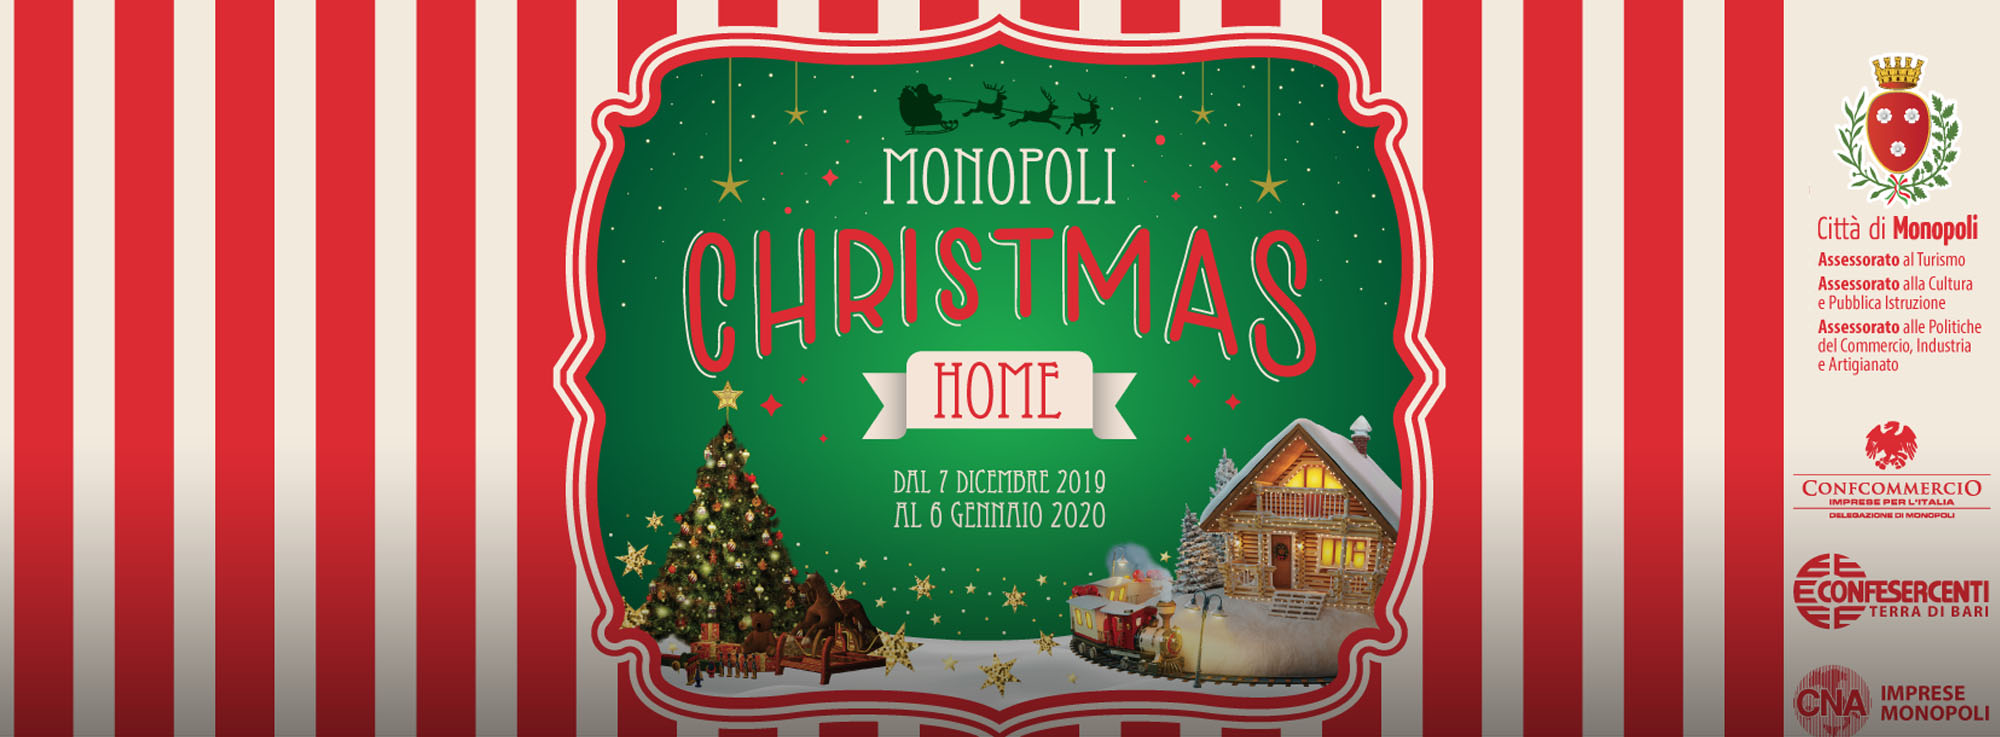 Monopoli: Monopoli Christmas Home